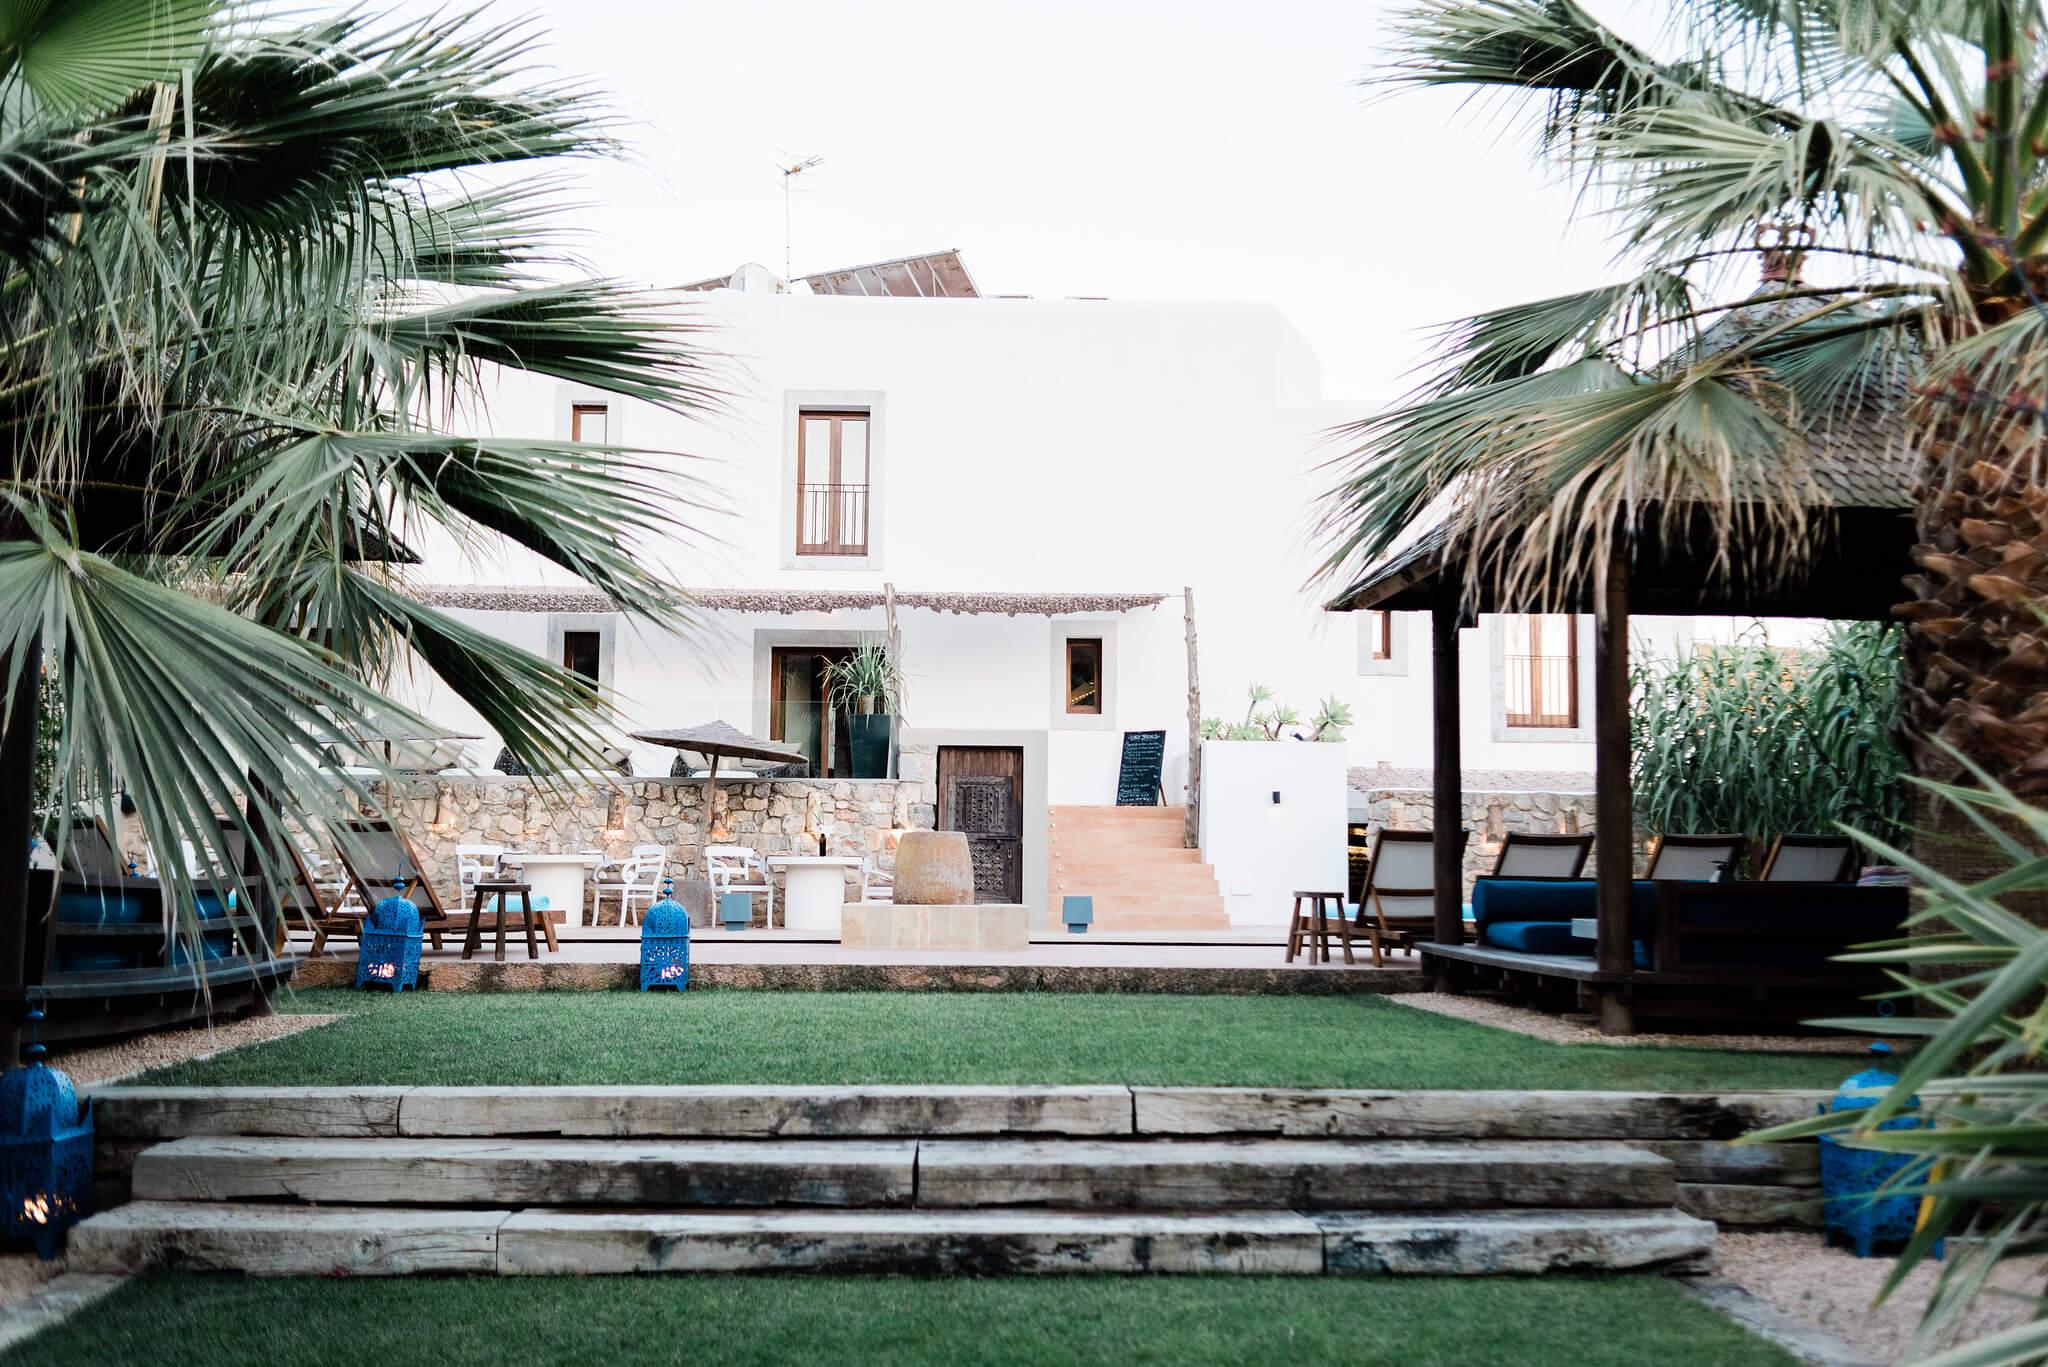 https://www.white-ibiza.com/wp-content/uploads/2020/03/white-ibiza-boutique-hotels-the-giri-residence-2020-09.jpg